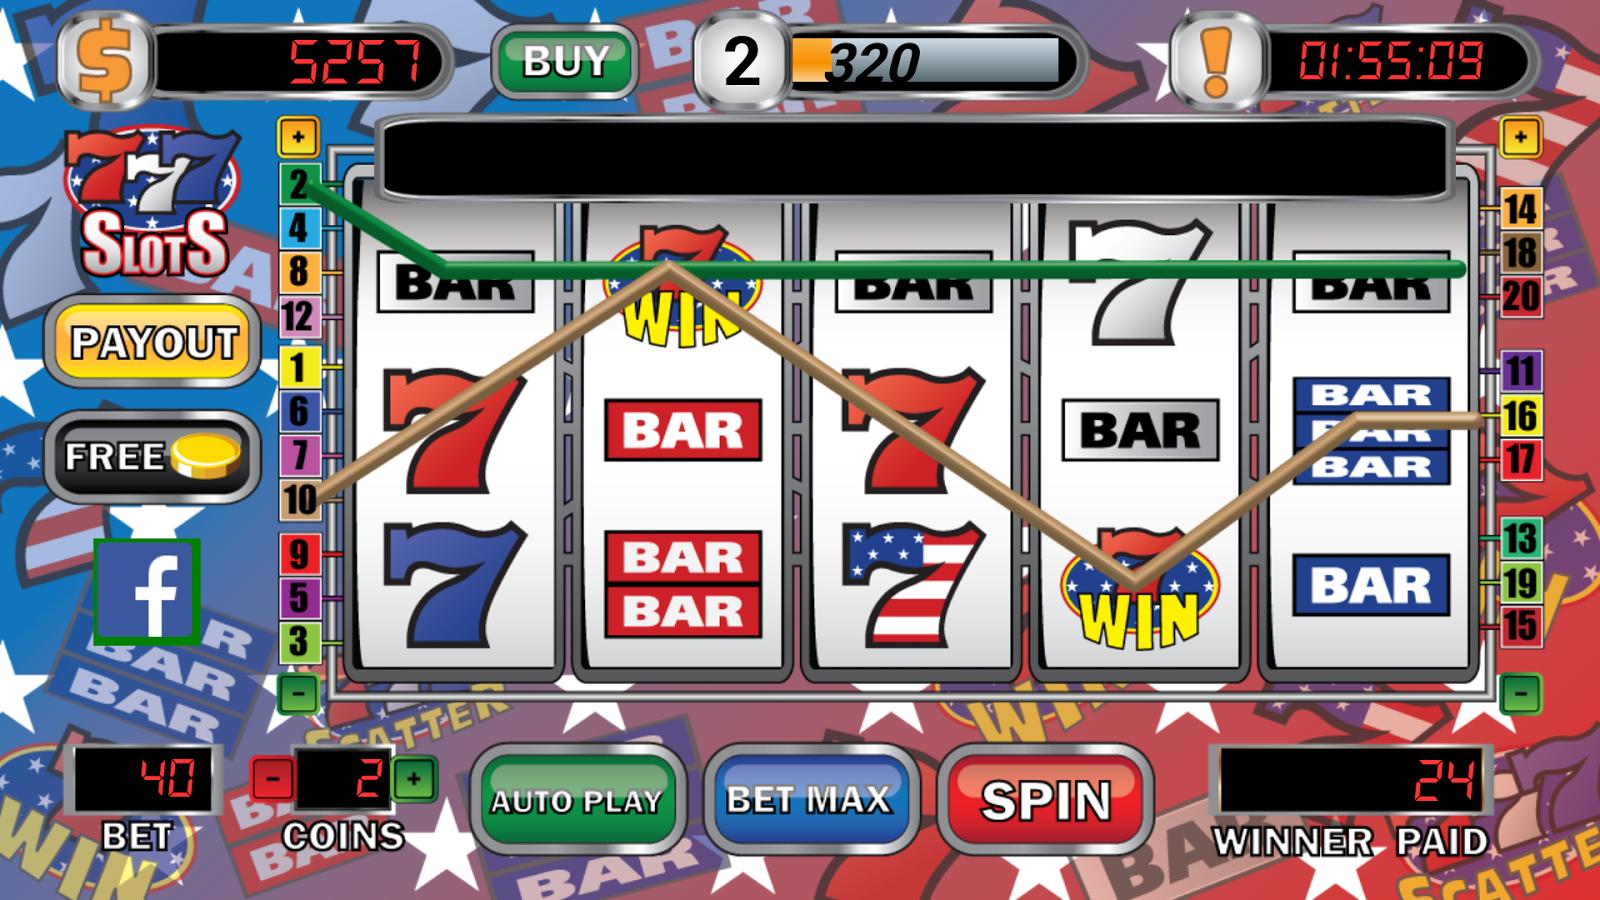 Play Online Slot Machines with 250 Bonus at Slots of Vegas!